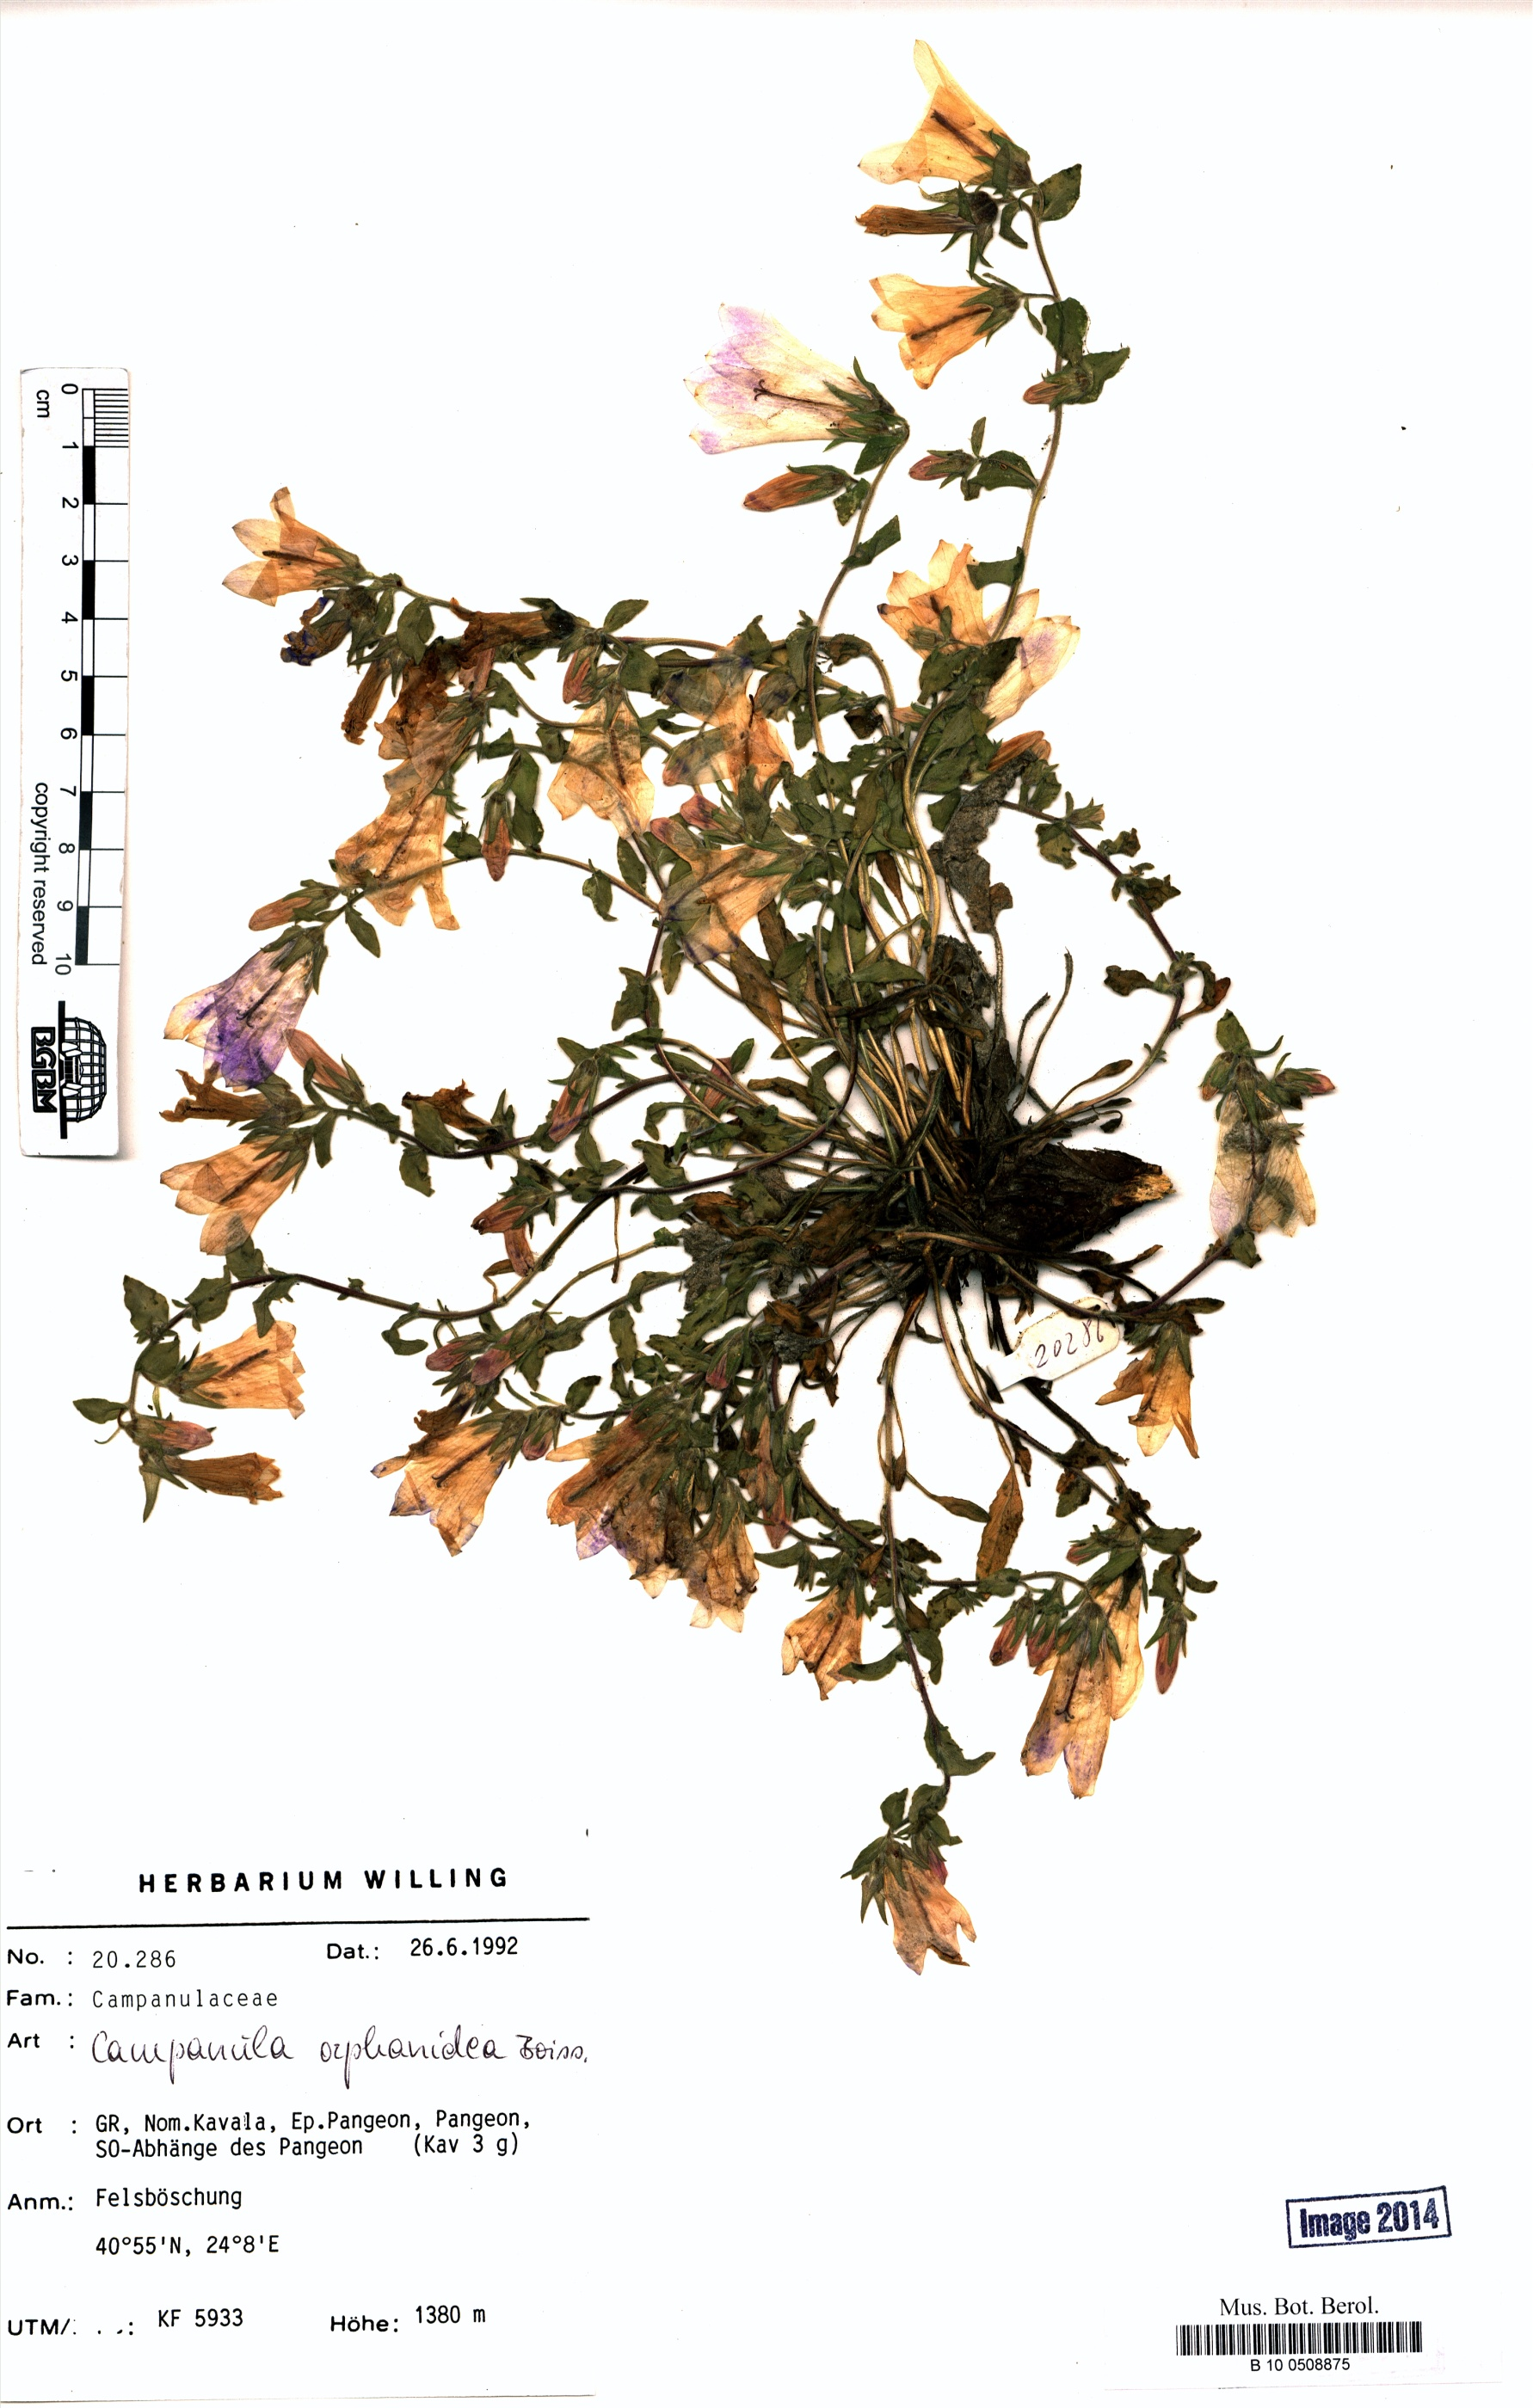 http://ww2.bgbm.org/herbarium/images/B/10/05/08/87/B_10_0508875.jpg